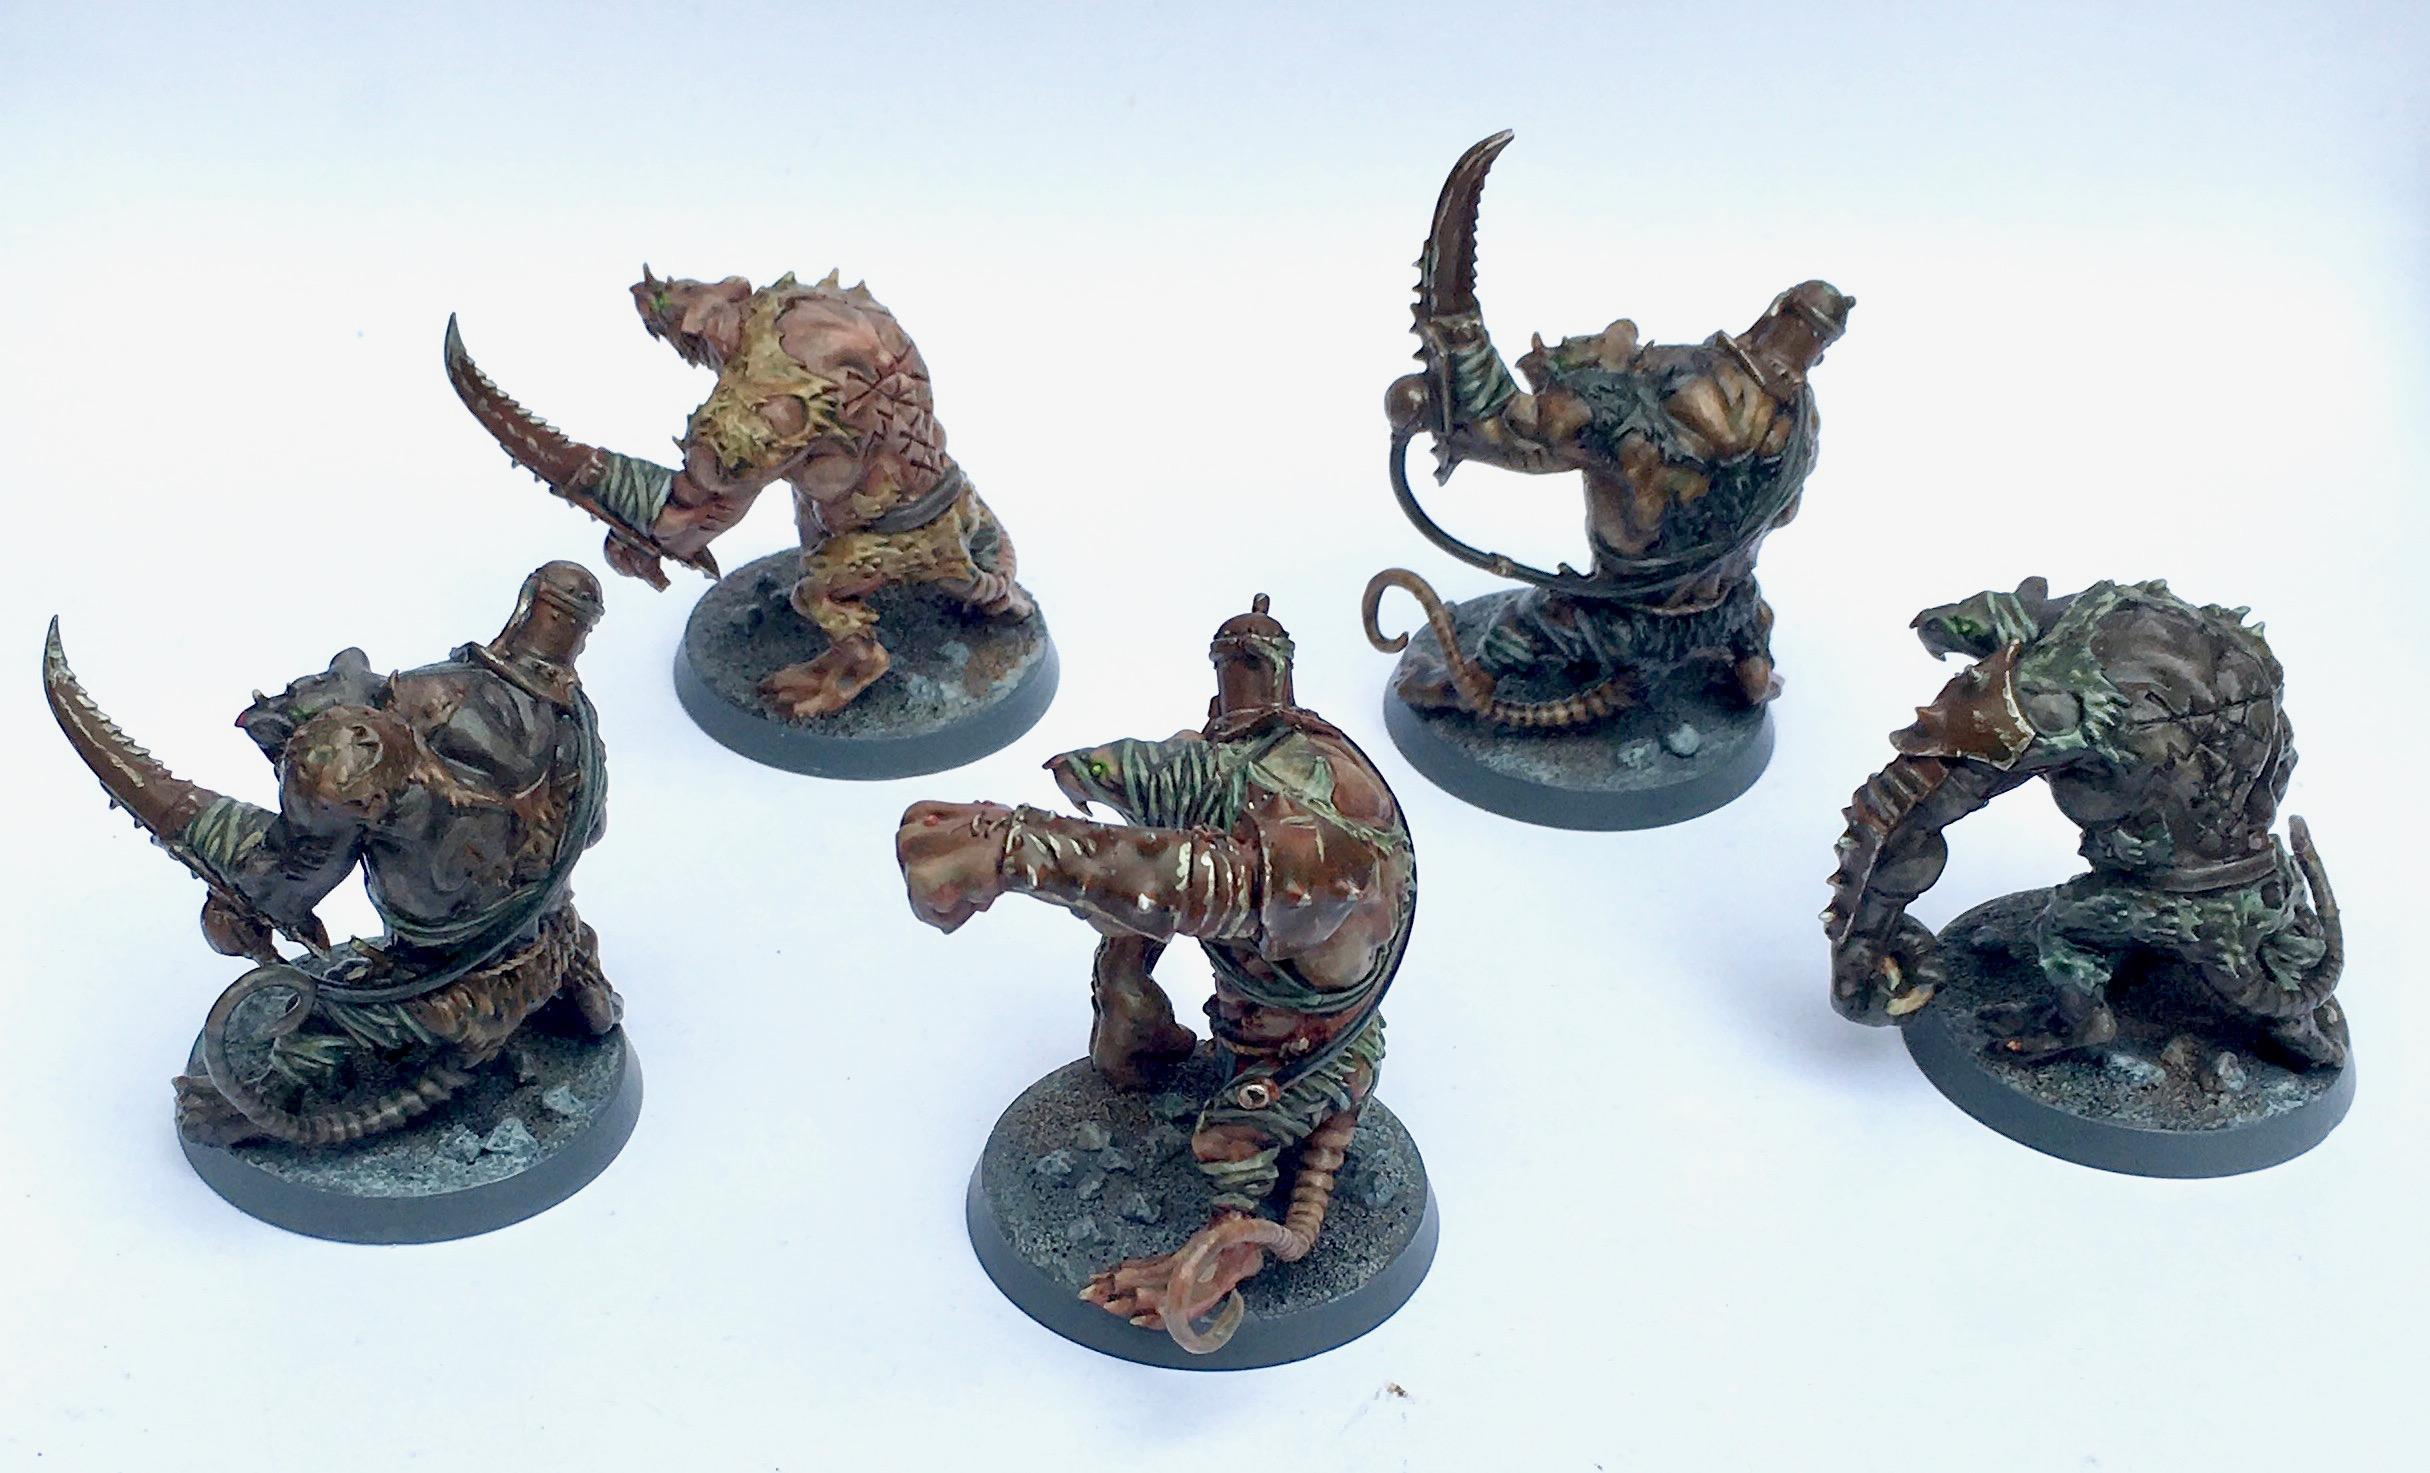 Chaos Spawn, Death Guard, Nurgle, Rat Ogres, Skaven